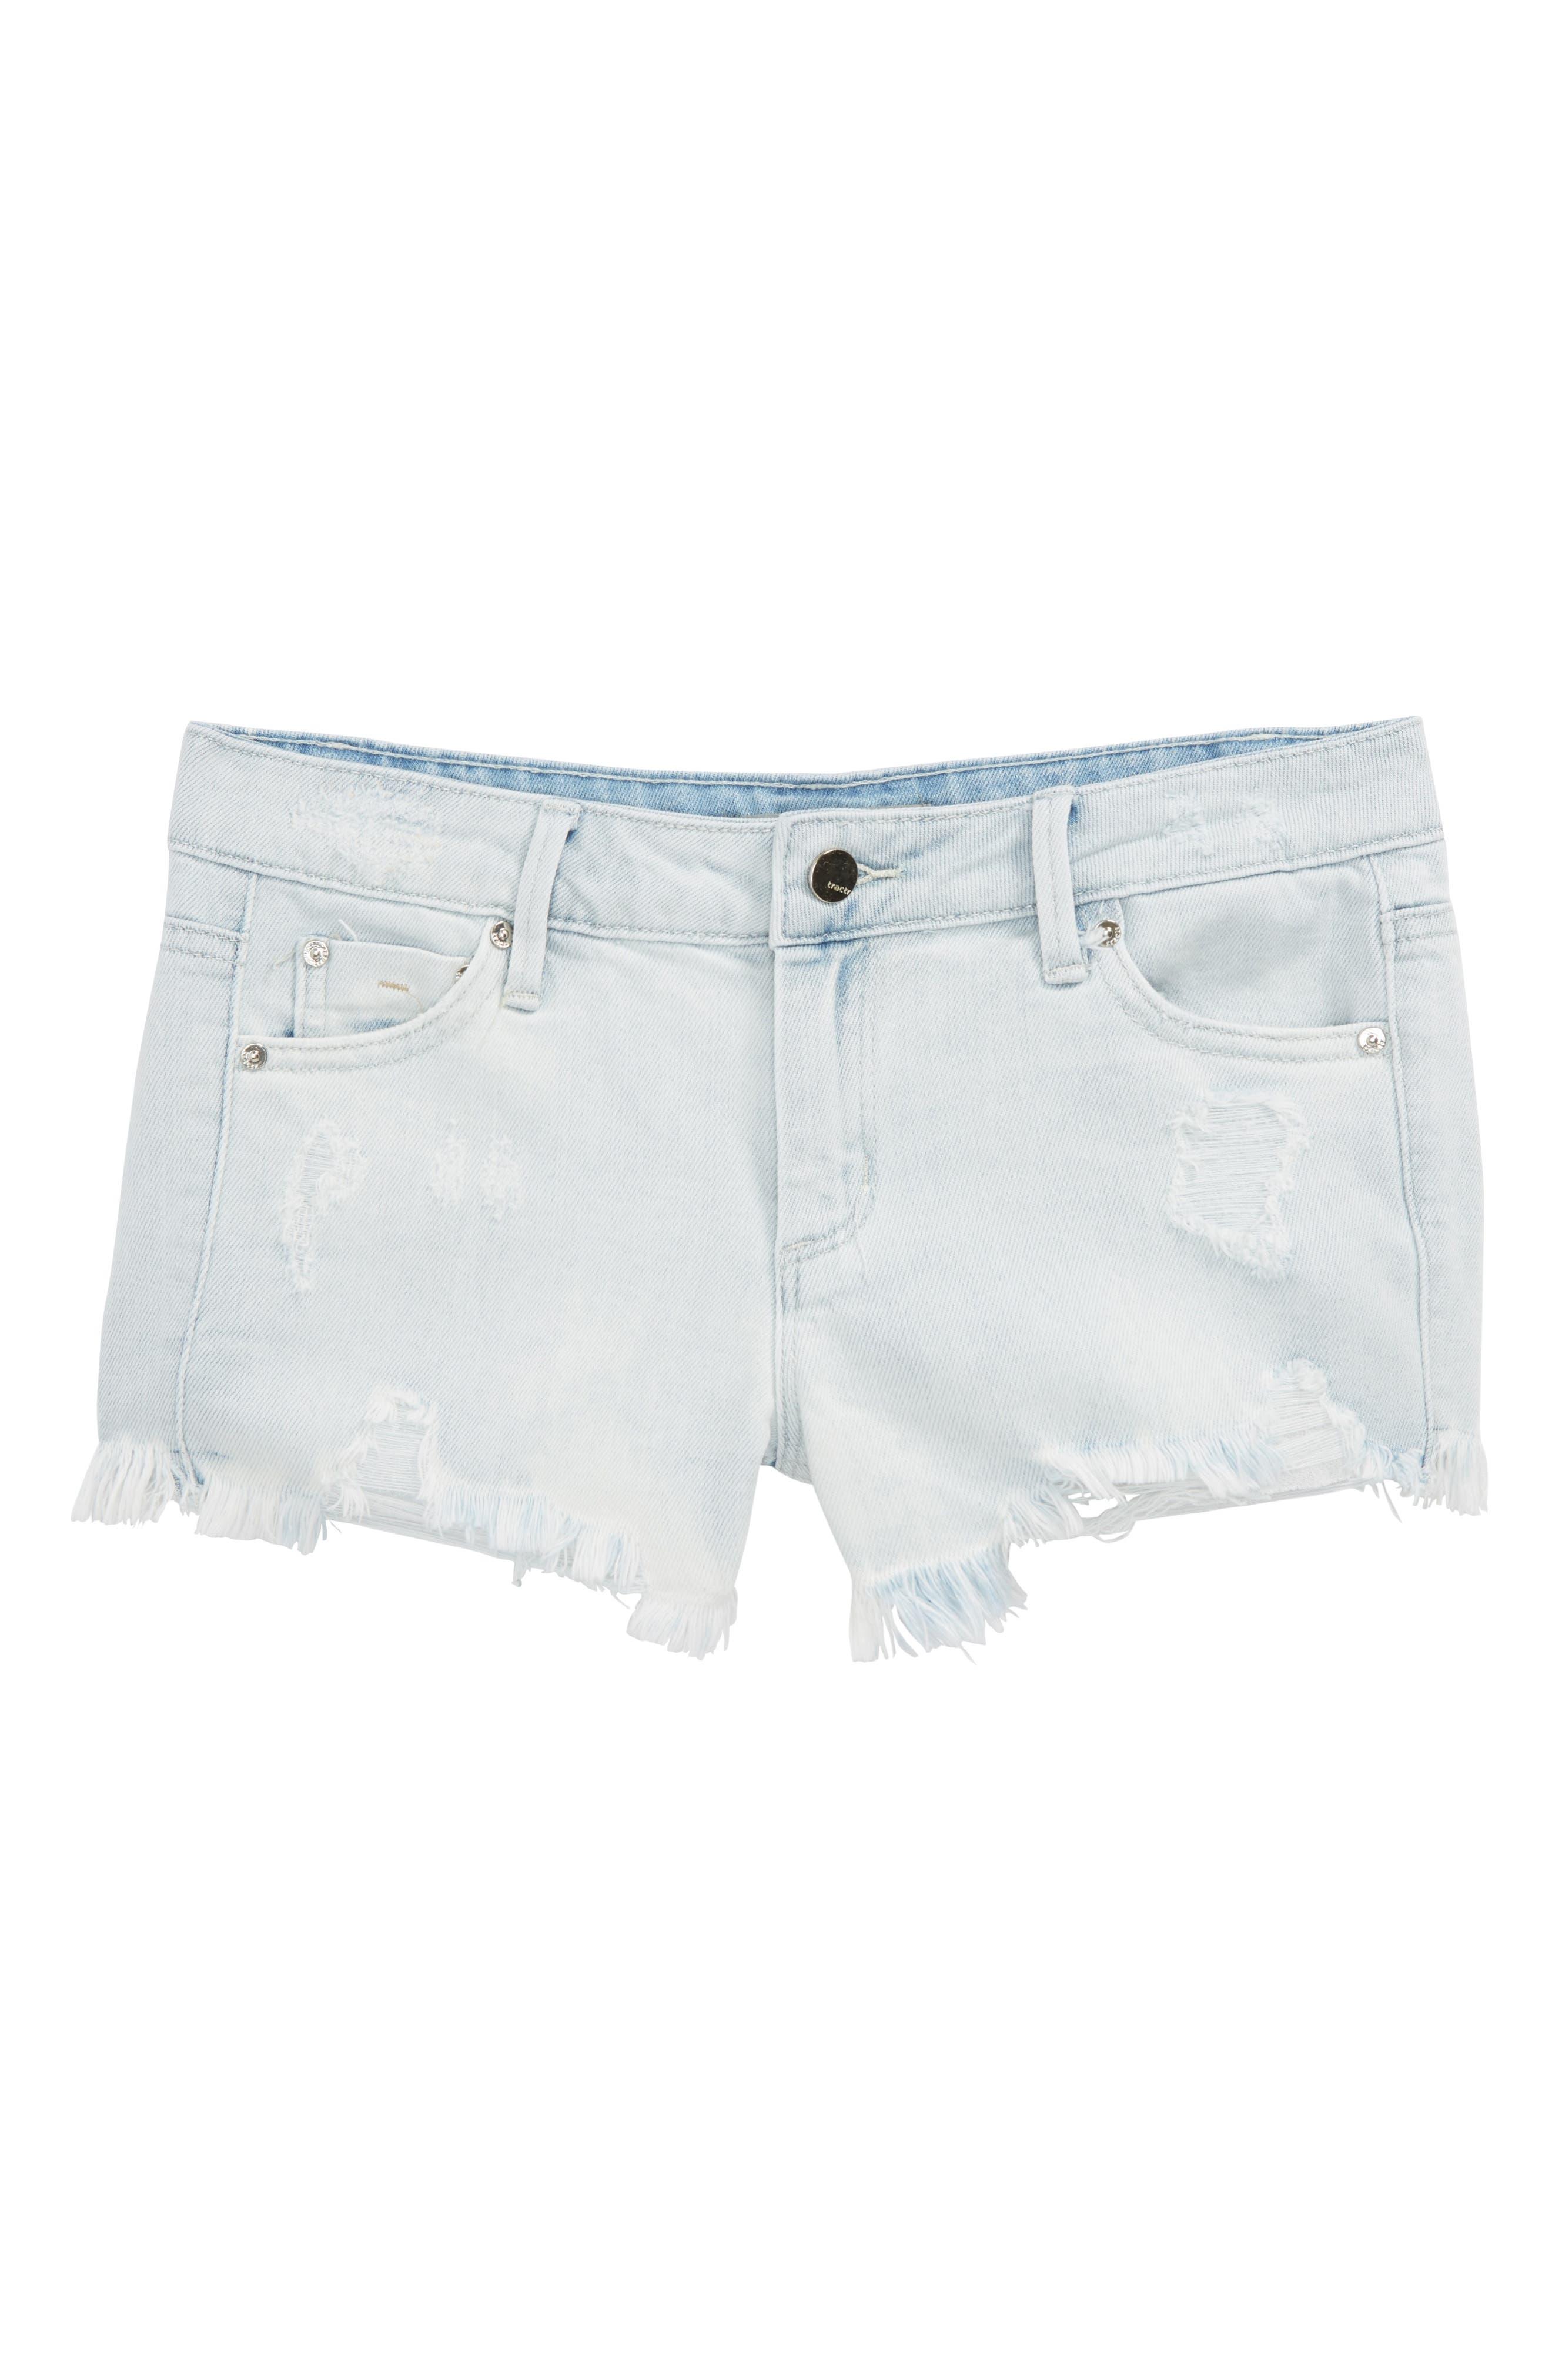 Destructed Frayed Denim Shorts,                             Main thumbnail 1, color,                             461